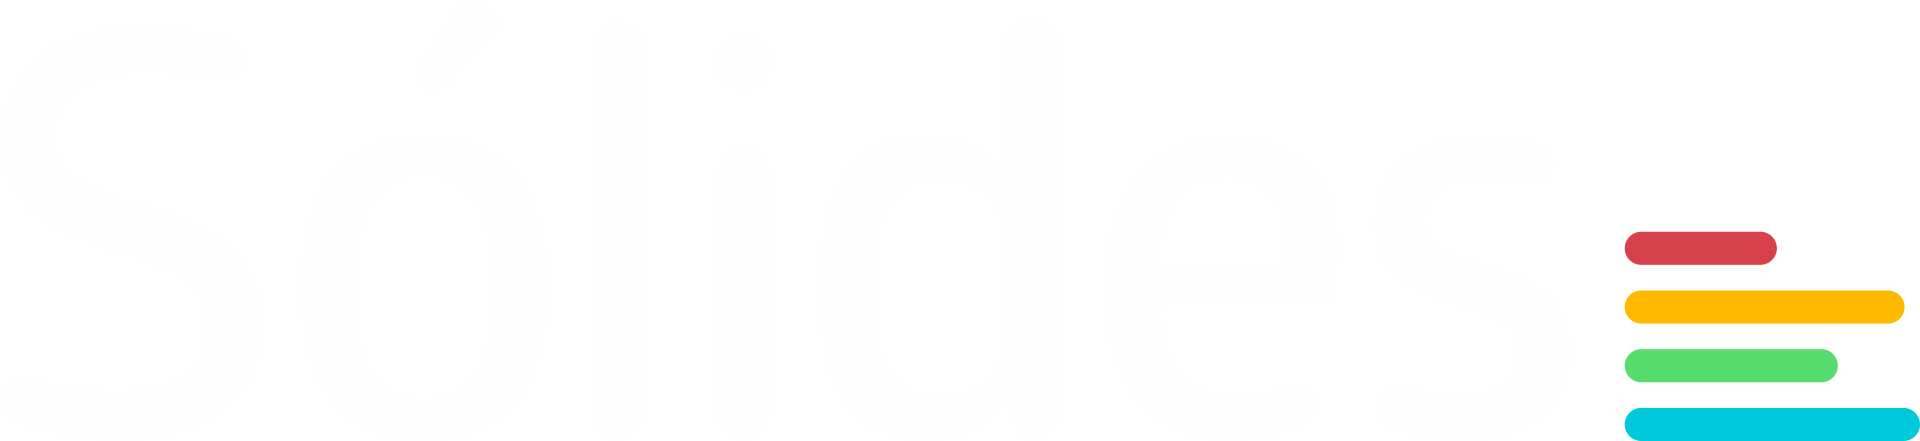 Sólides